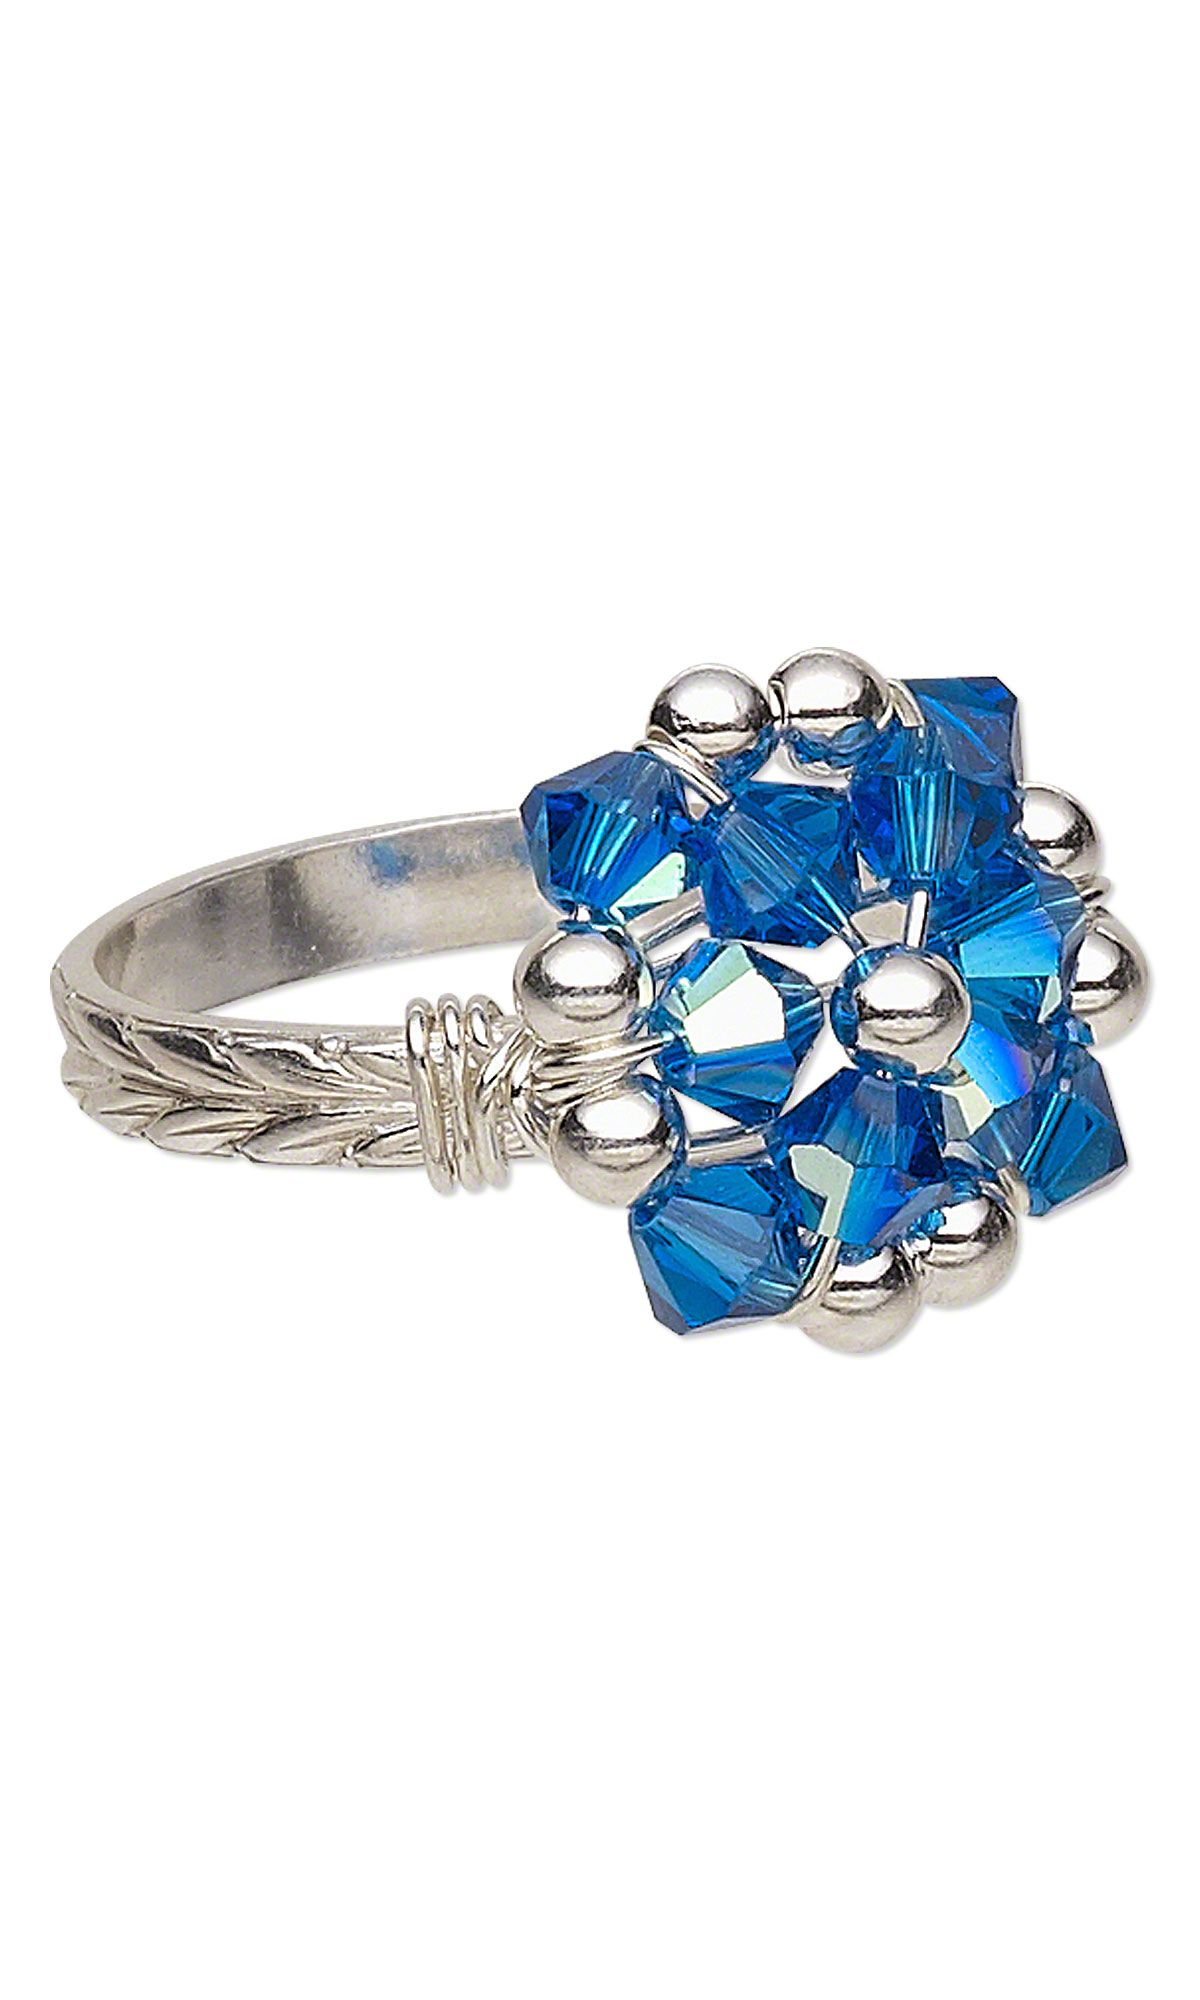 726b462e12a5 Jewelry Design - Ring with Swarovski Crystal Beads